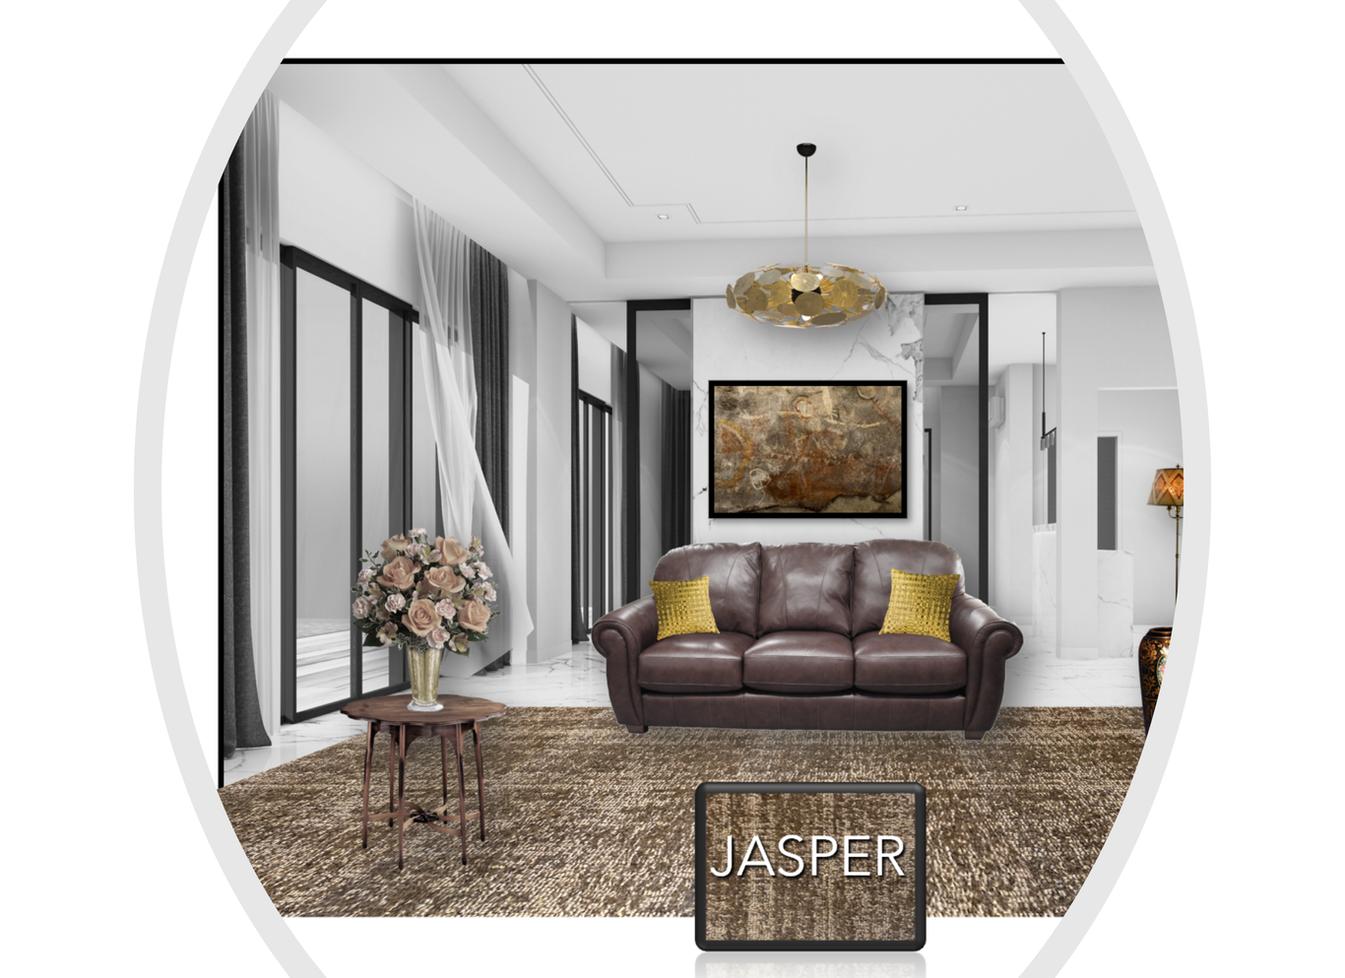 05-Bellisimo Jasper.PNG